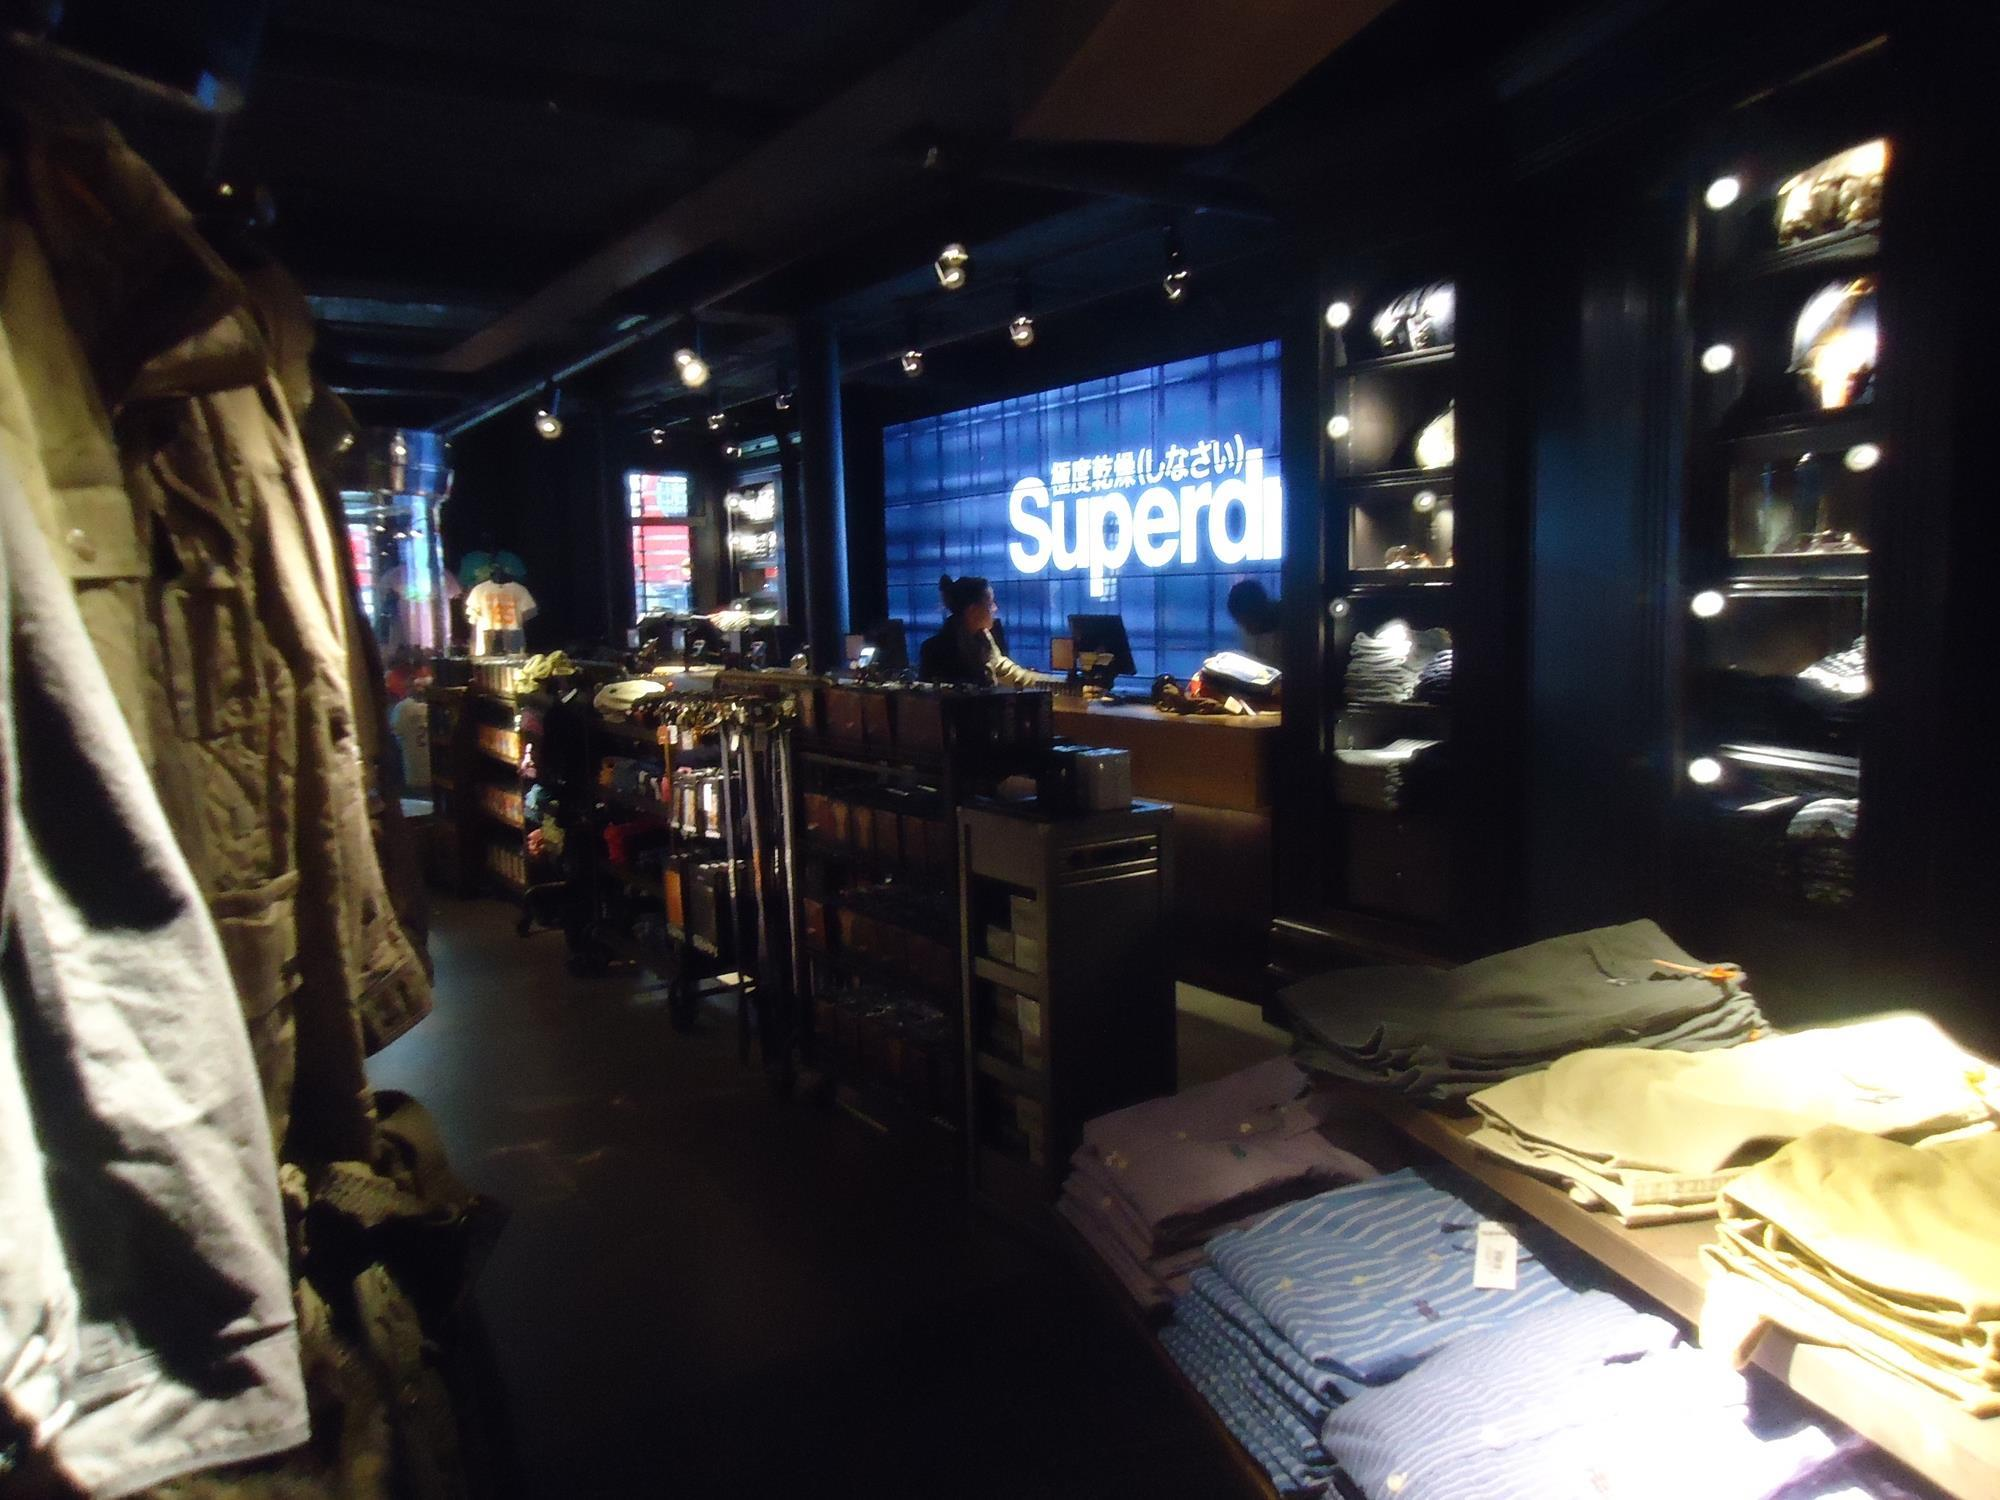 superdry store manager salary ‹ Brick Lane Studios York